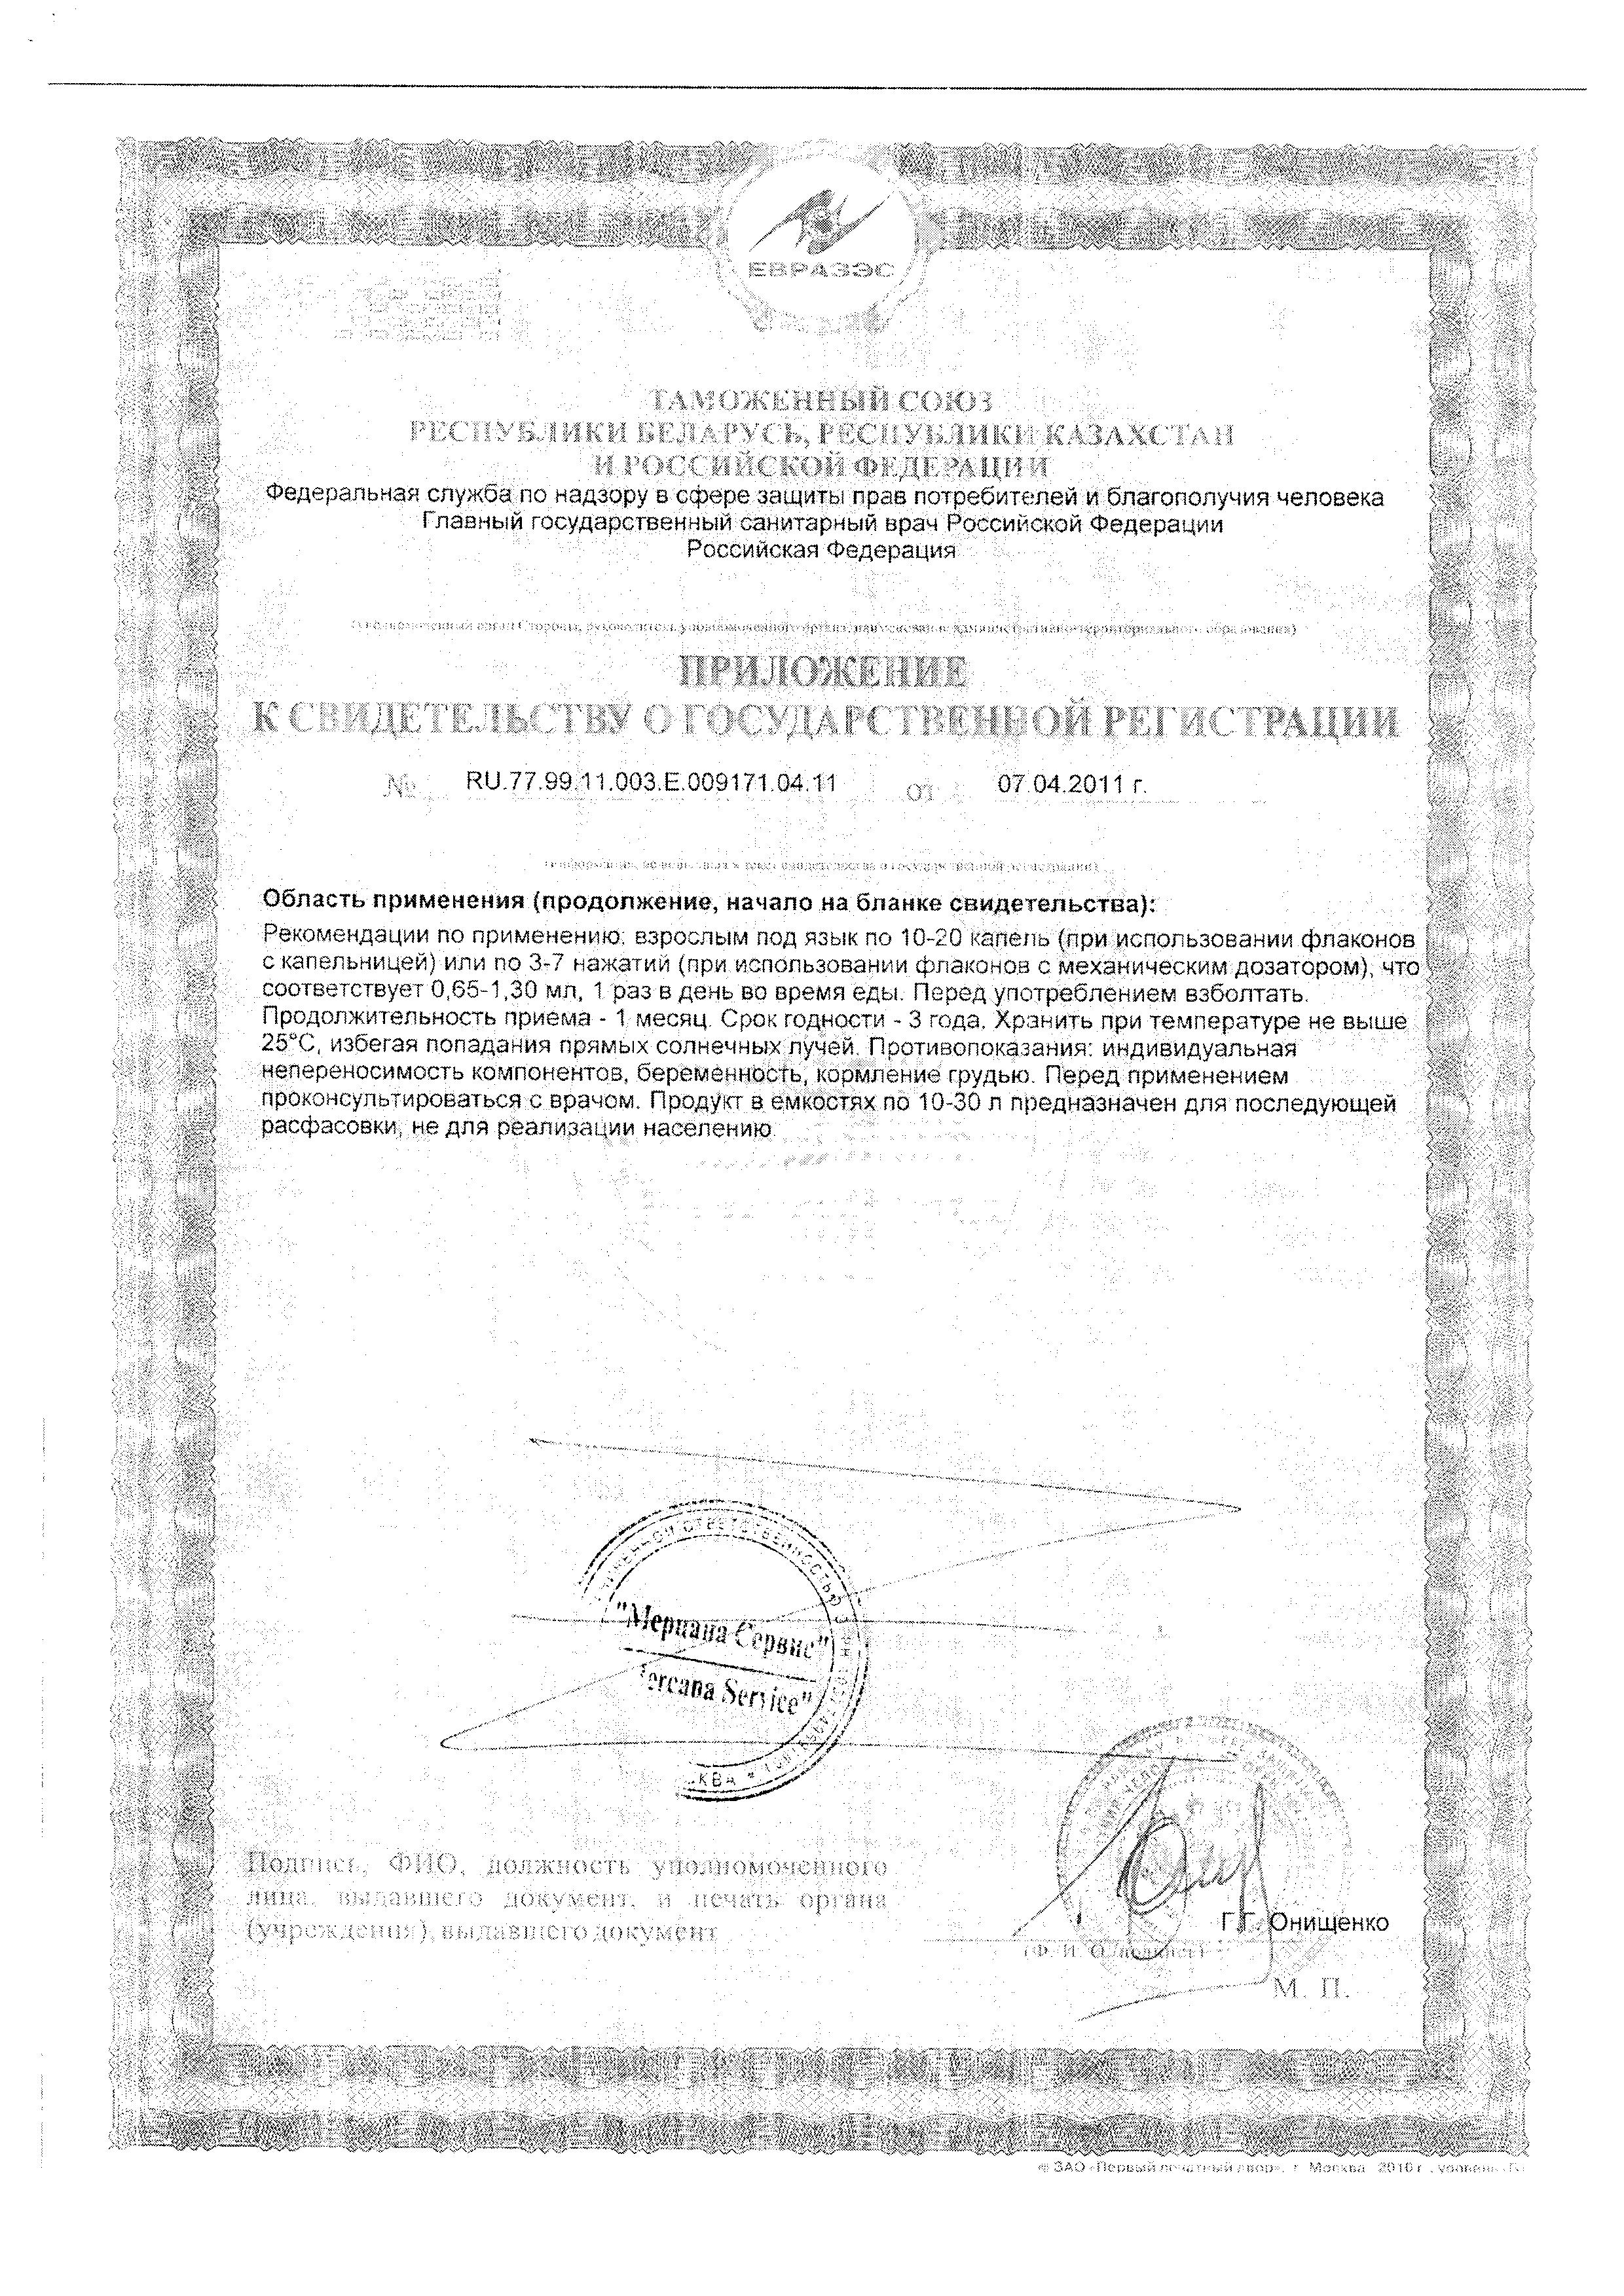 ФЭТ-Х (Пиколинат хрома) сертификат